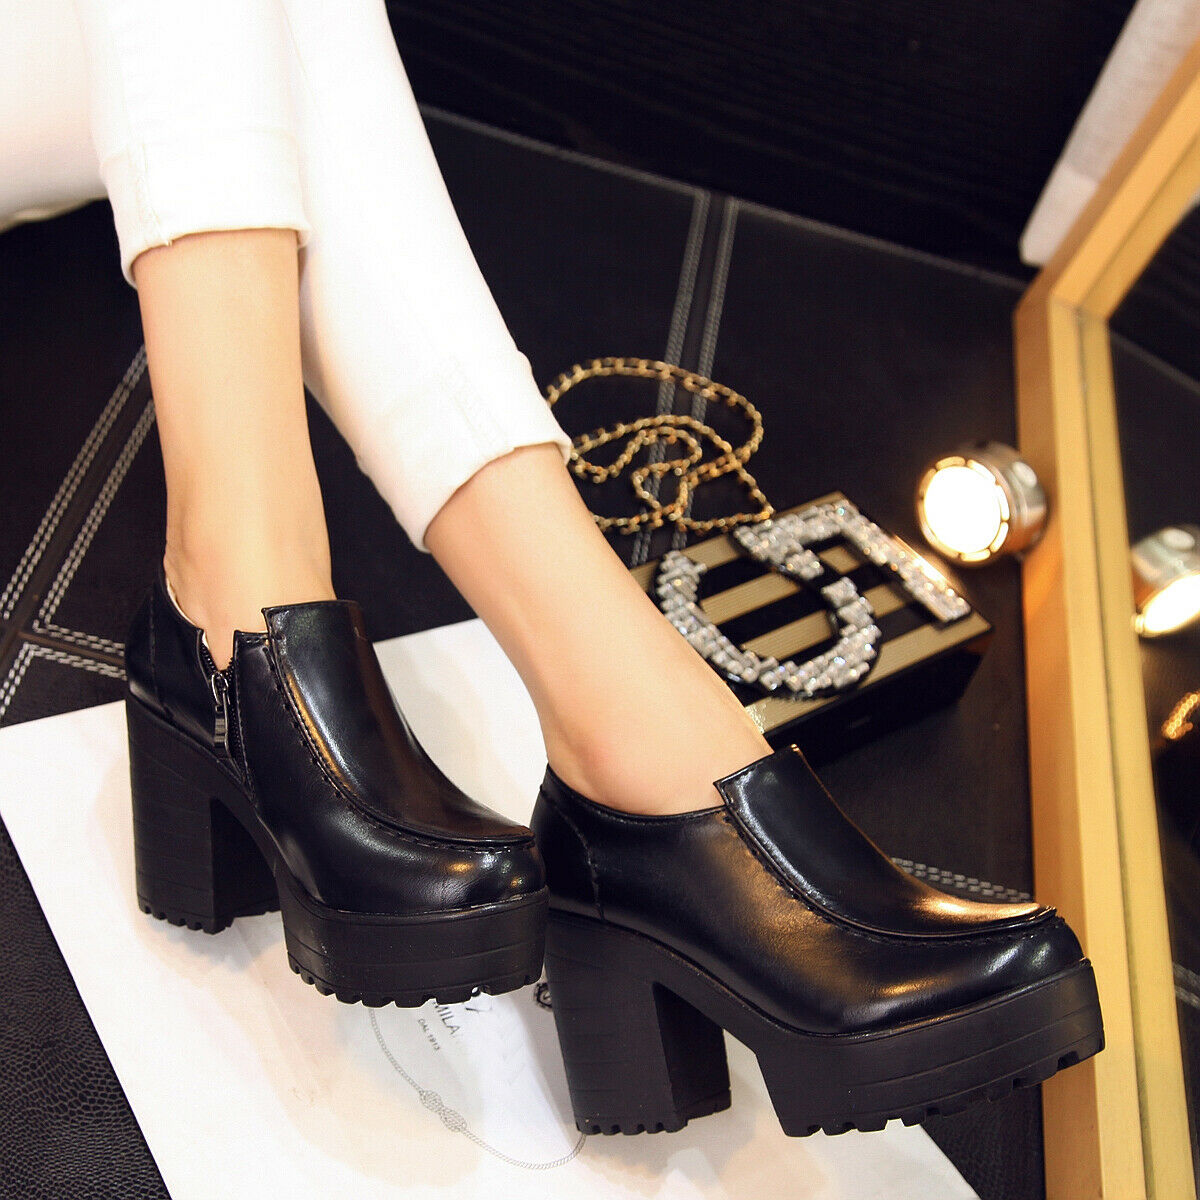 Women Ladies British Style Pumps Platform Block Heel Side Zip Solid Casual shoes